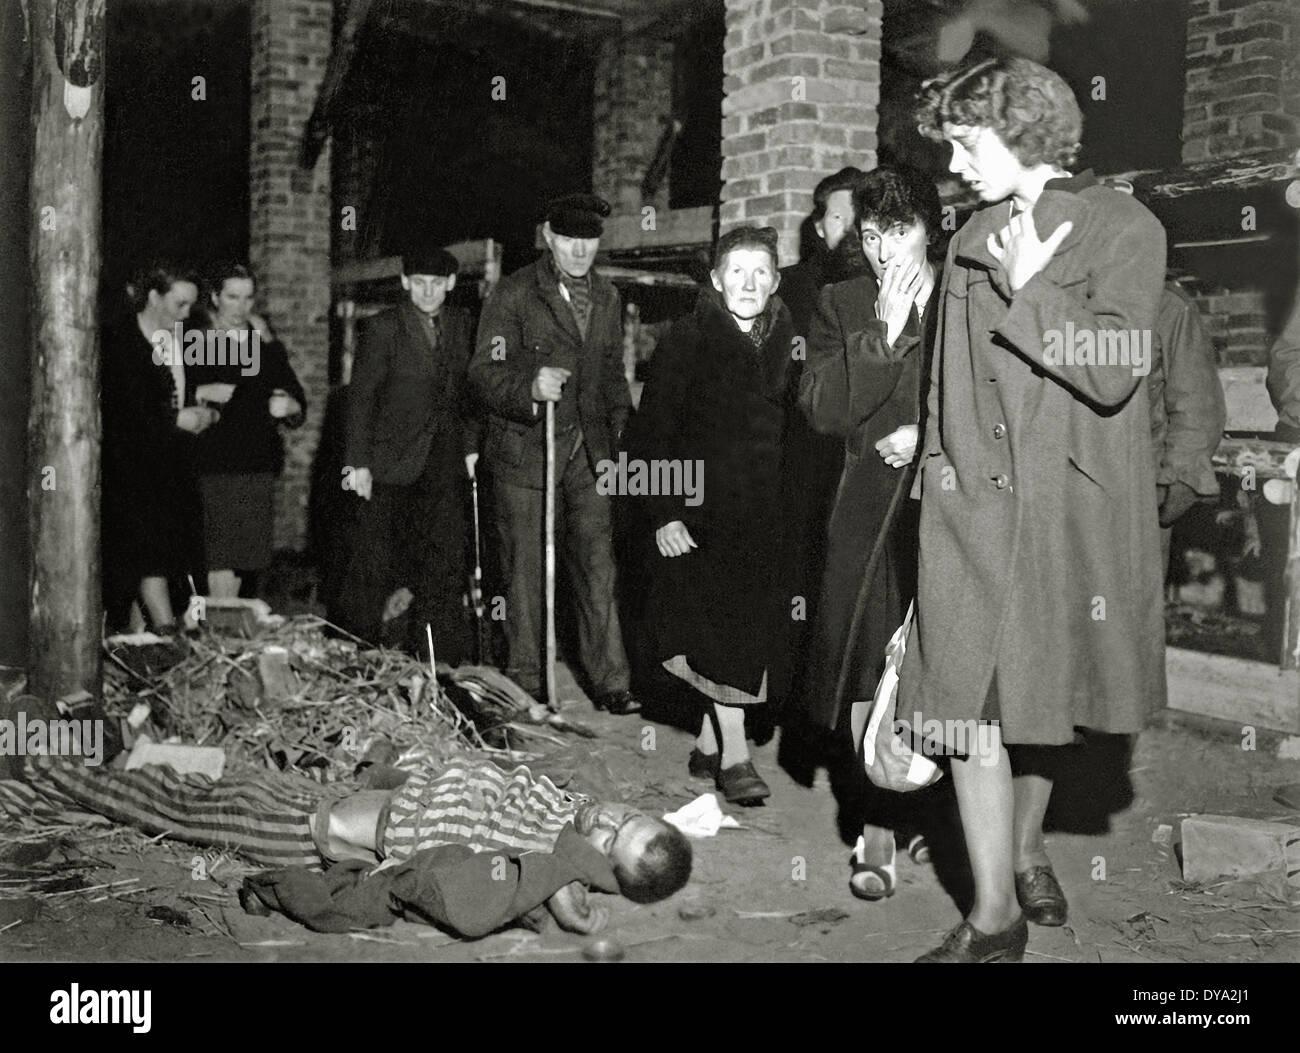 WW II historical war world war second world war Germany inhabitant resident visit Ludwigslust concentration camp KZ 1945 corp - Stock Image